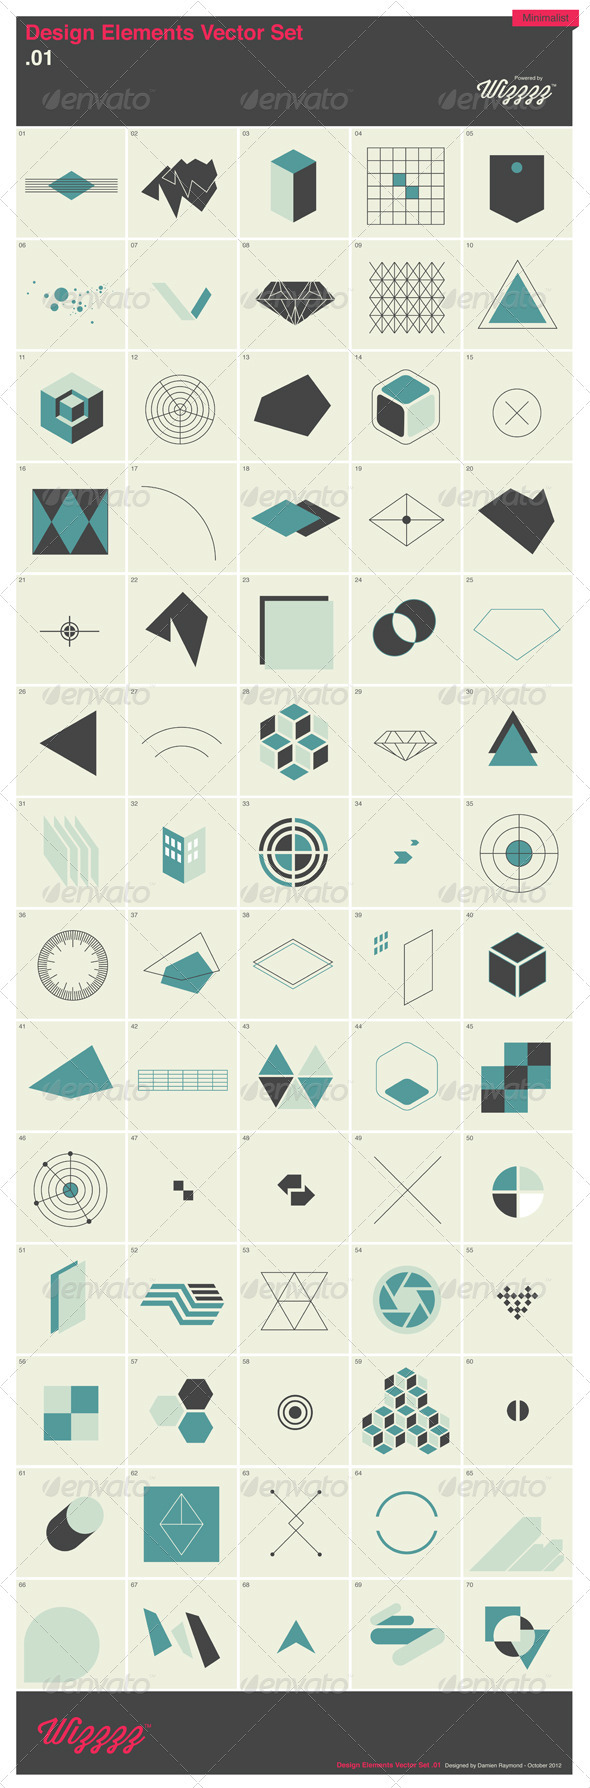 GraphicRiver 70 Design Elements Vector Set .1 3325484